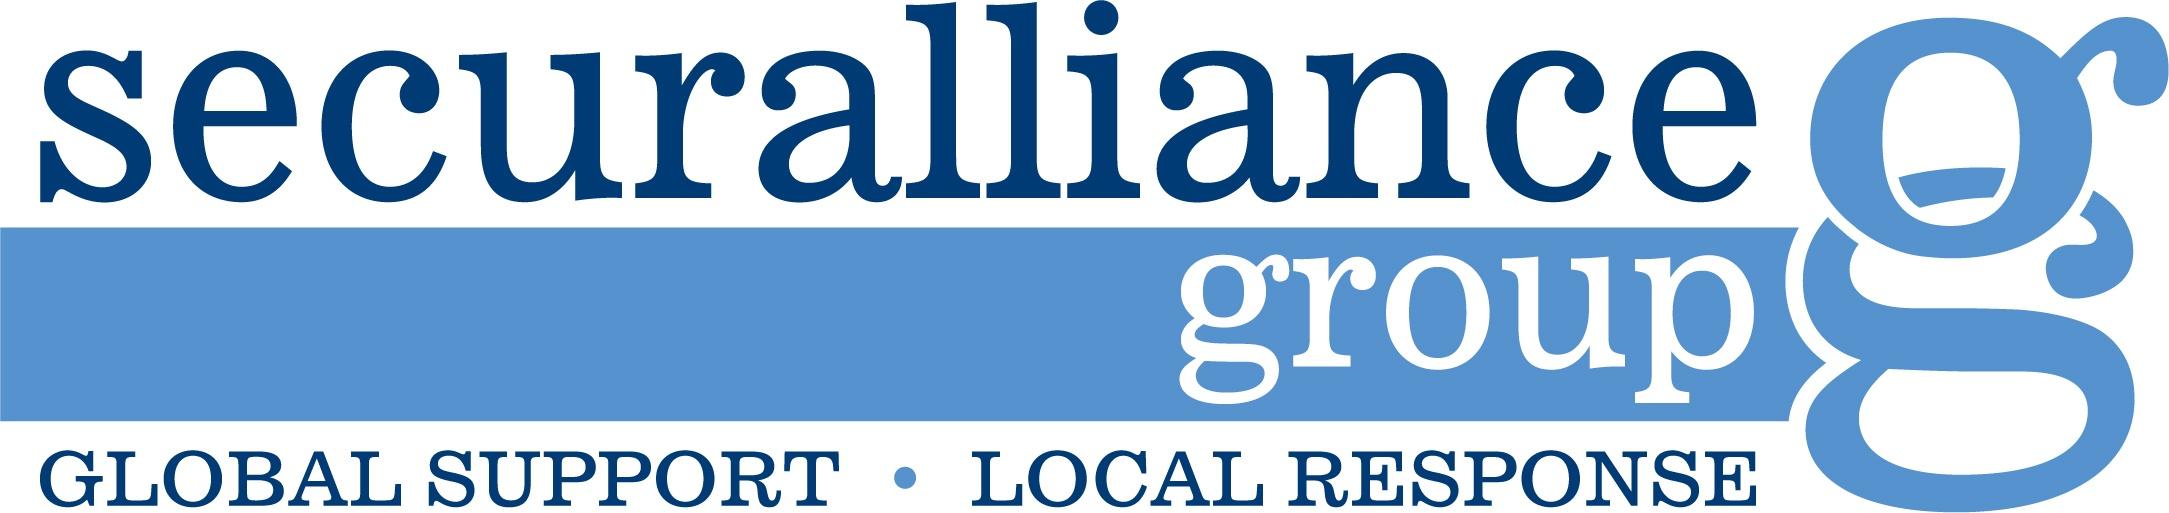 logo securalliance .jpg